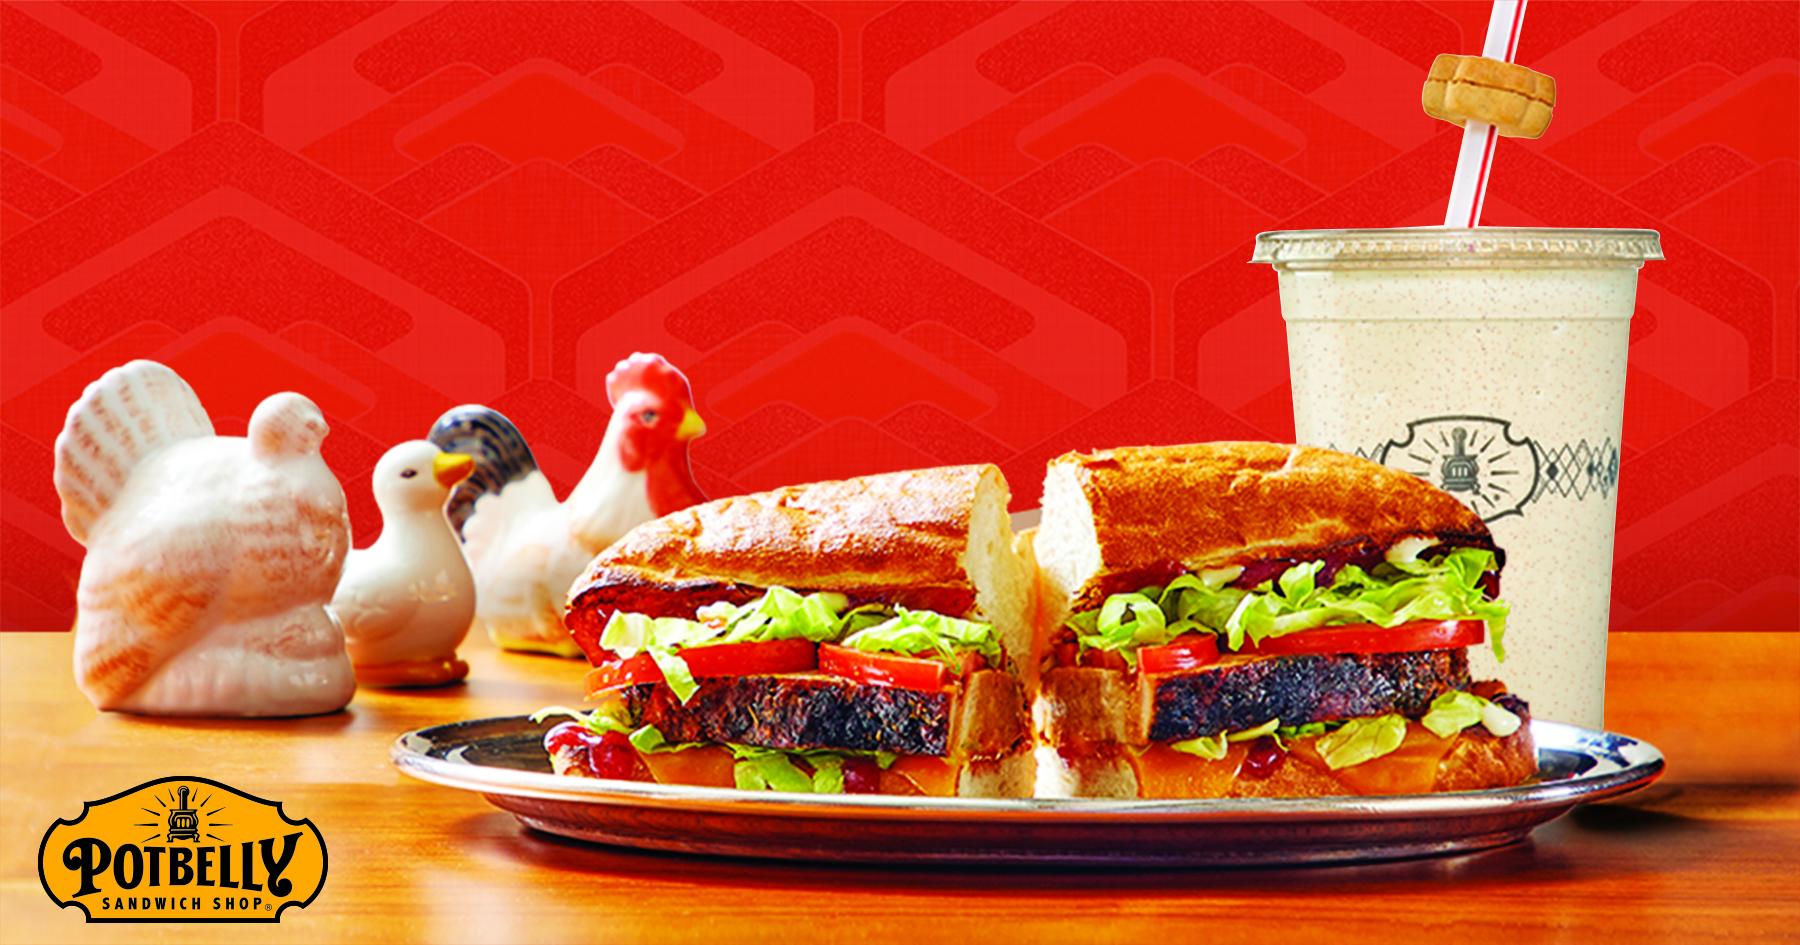 turducken sandwich